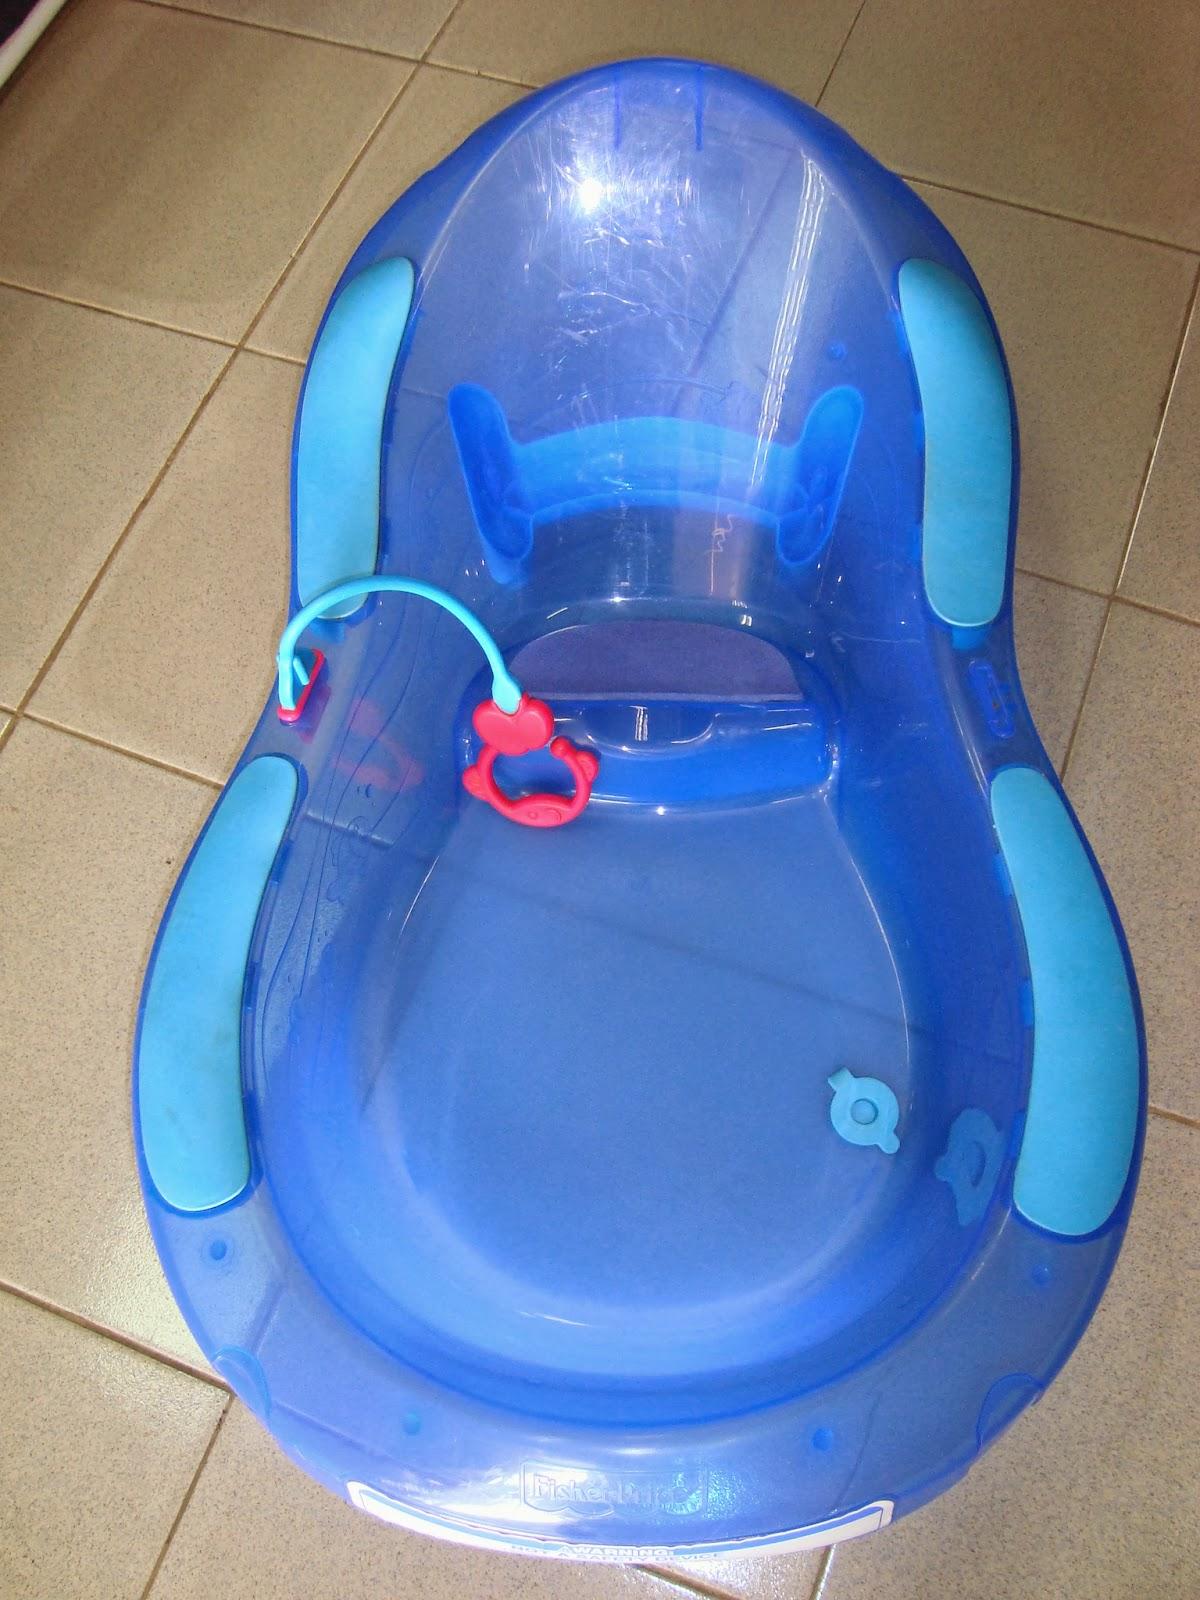 Preloved Toysworld Thetottoys Fisher Price Aquarium Bath Tub